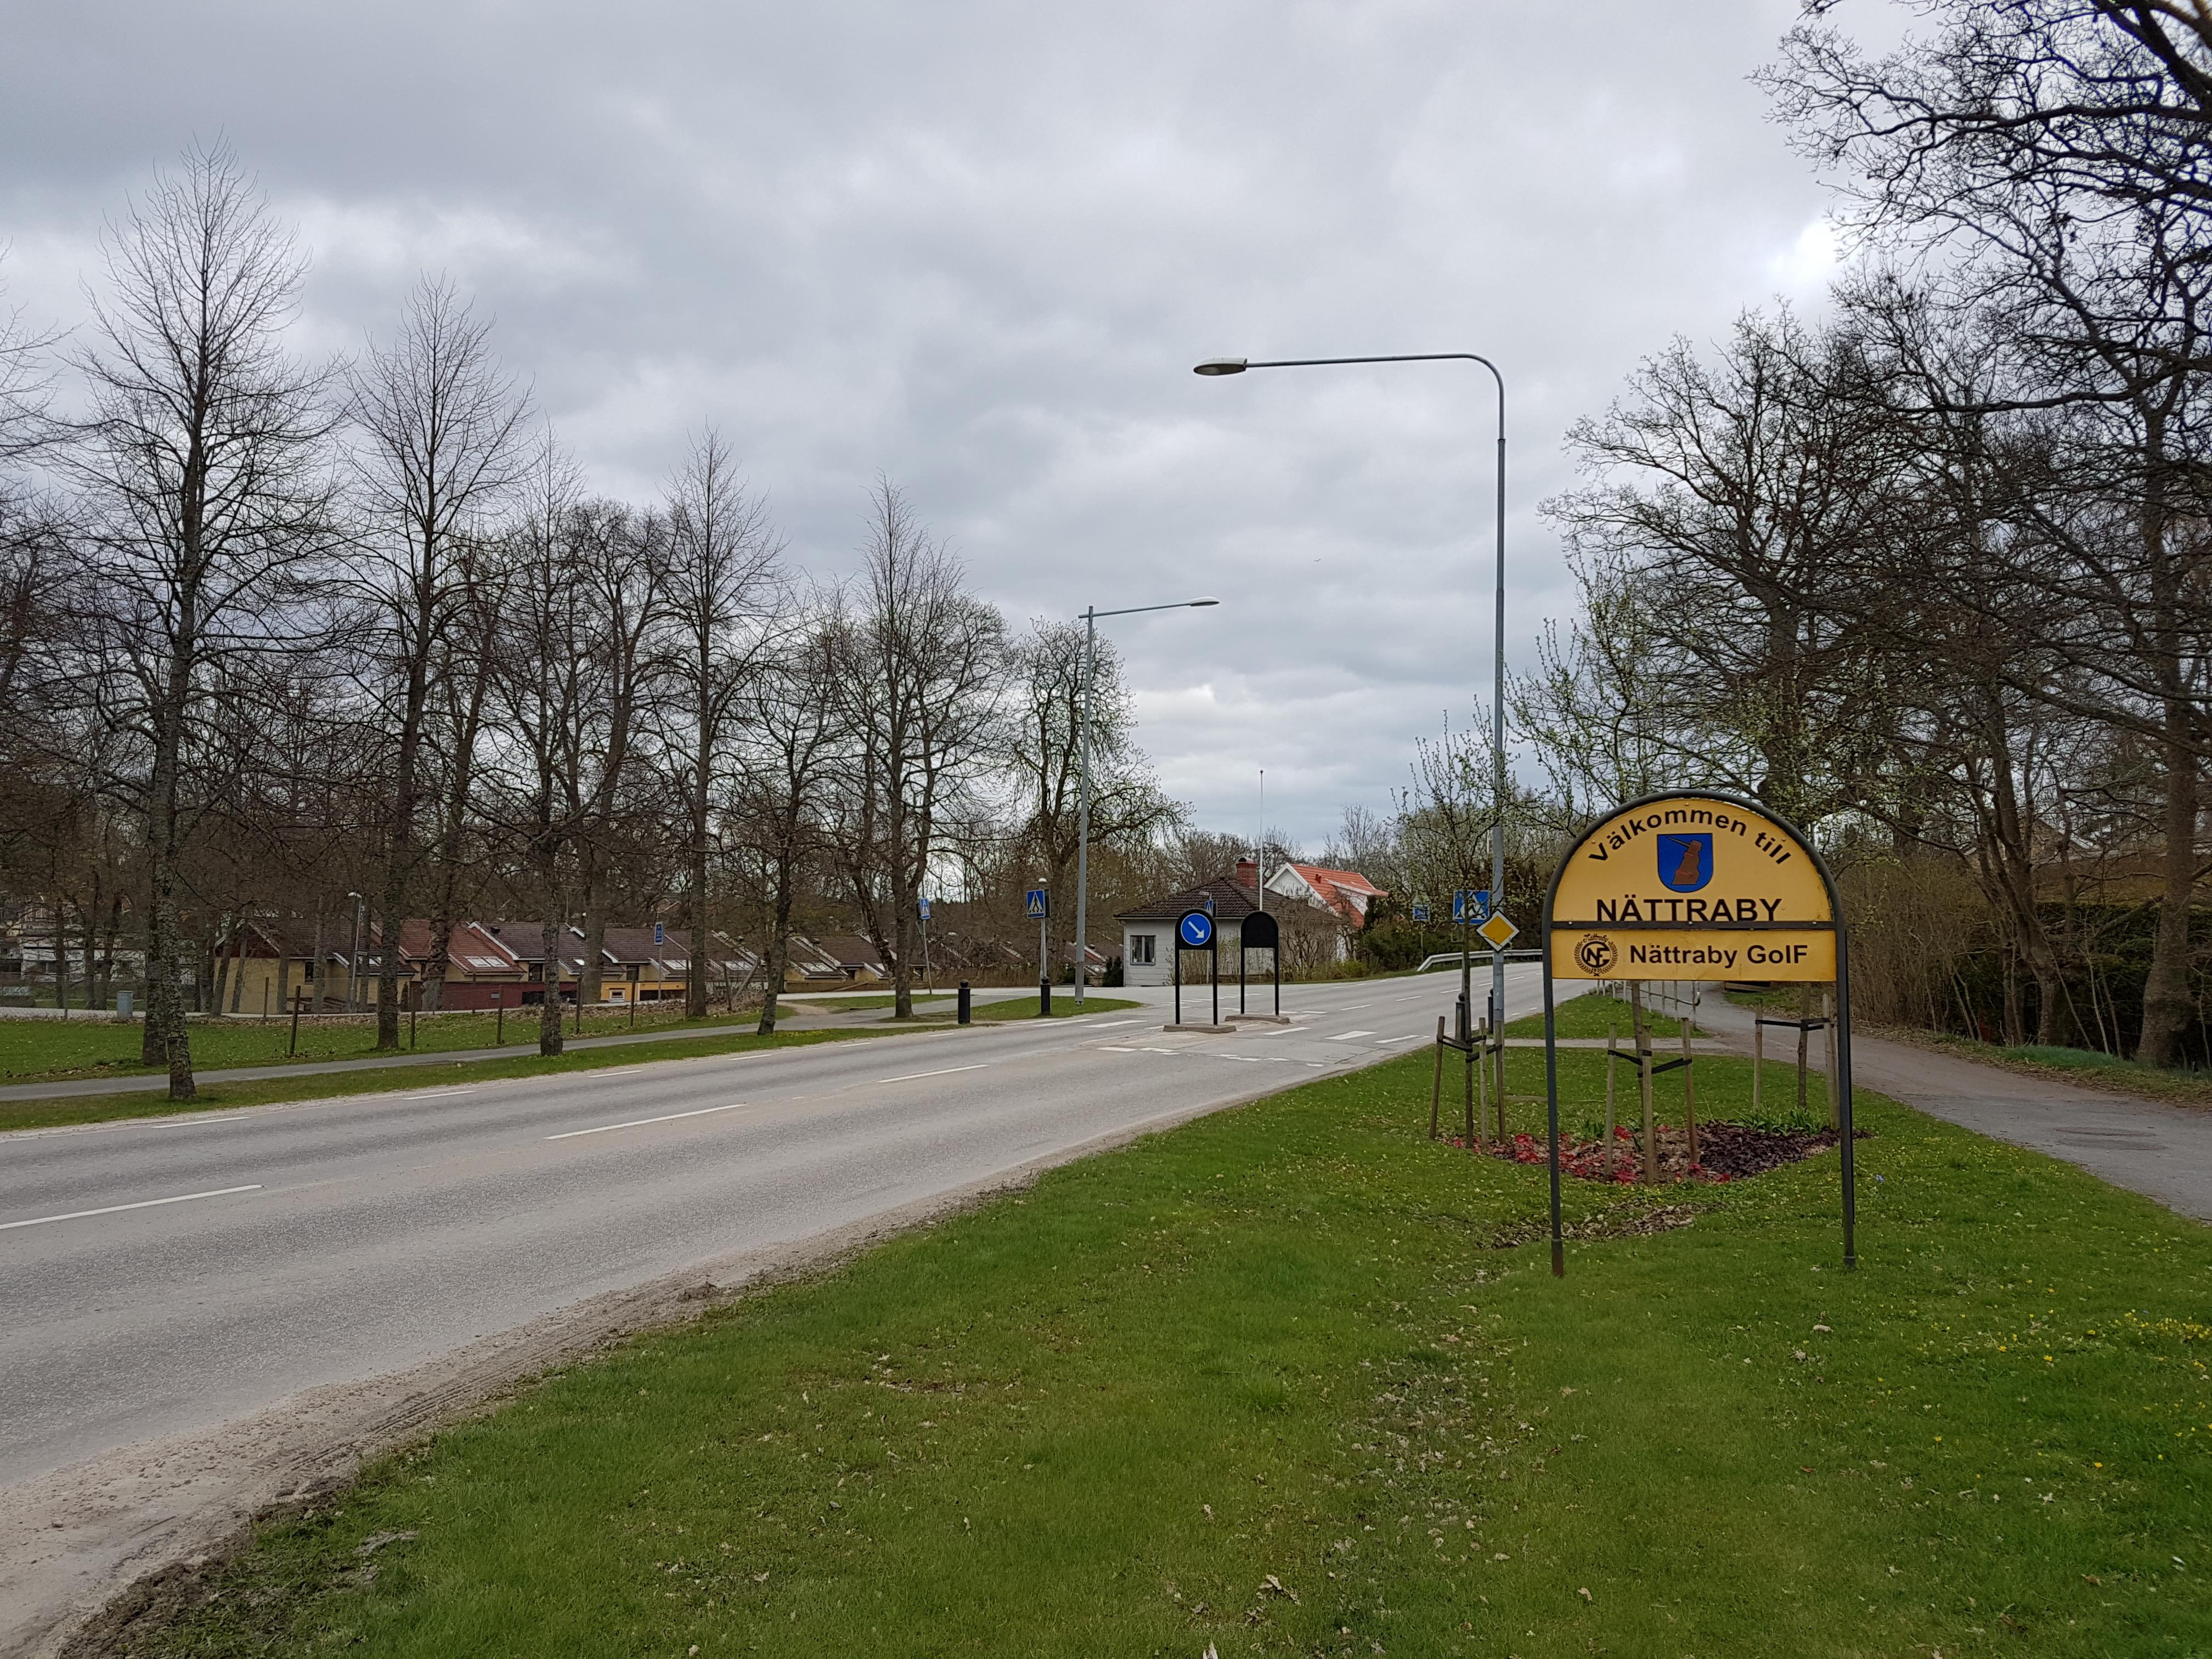 2019 - E22 Ronneby-Karlskrona delen trafikplats Ronneby ö-Nättraby